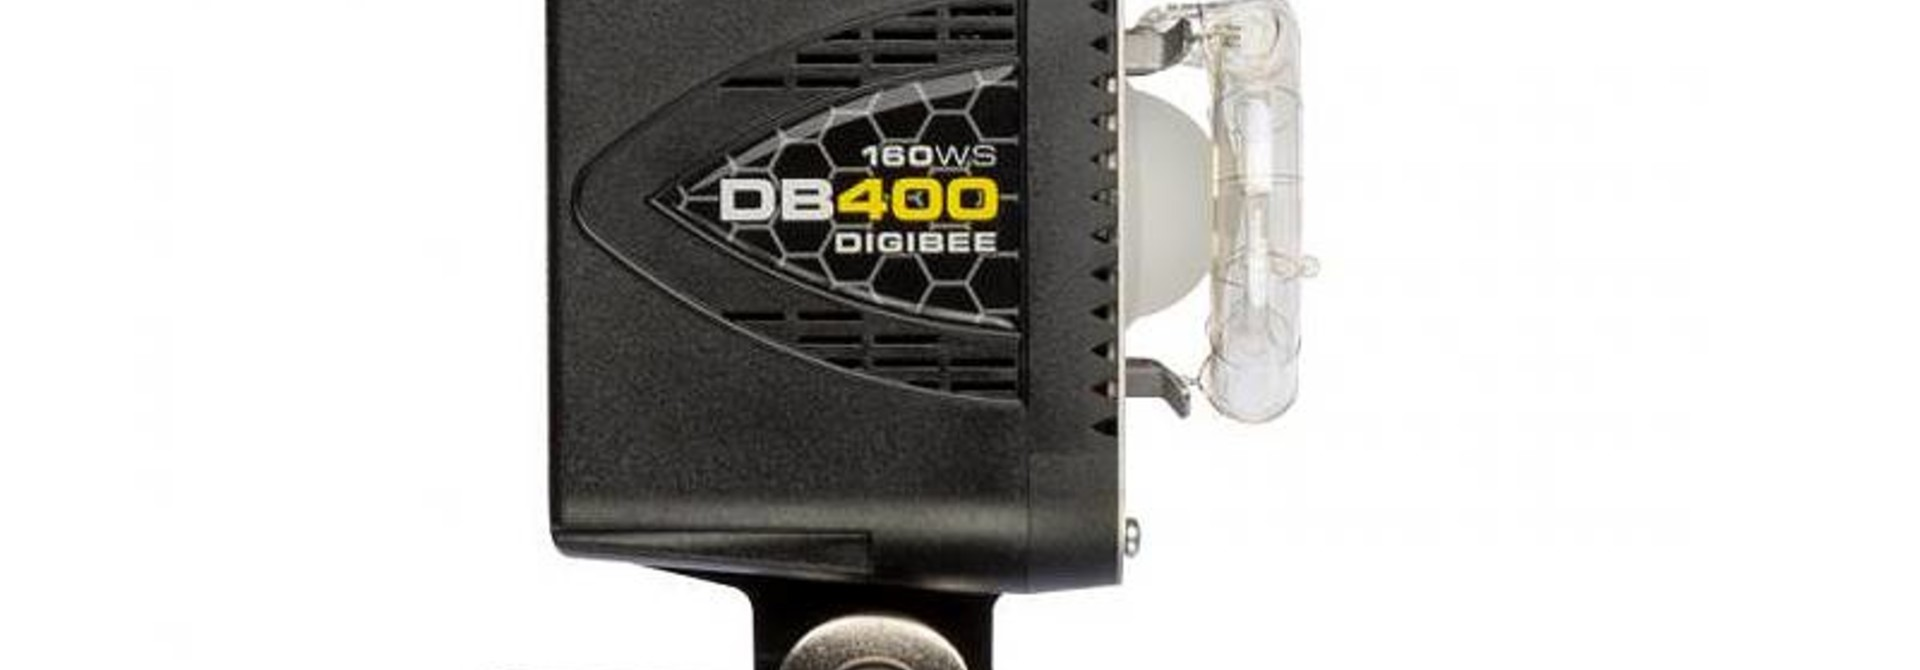 DigiBee Studioblitz DB400, DB800